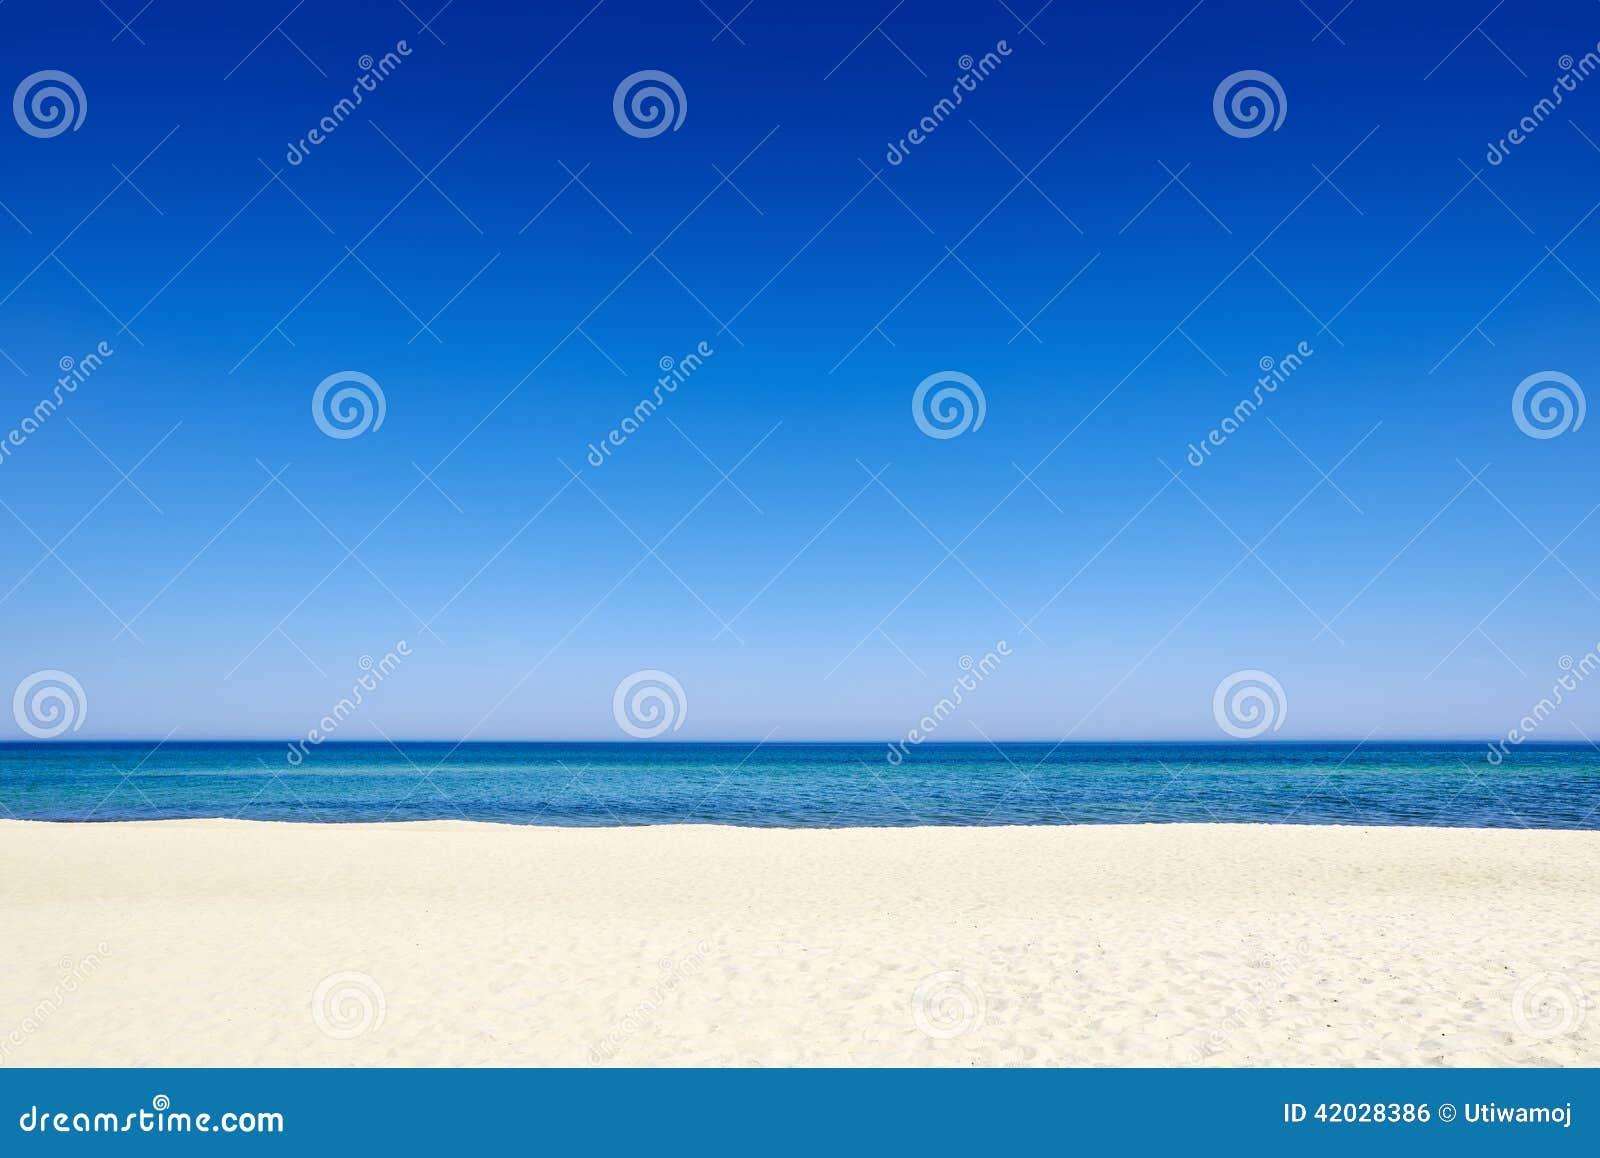 summer blue sky sea coast sand background beach stock photo - image